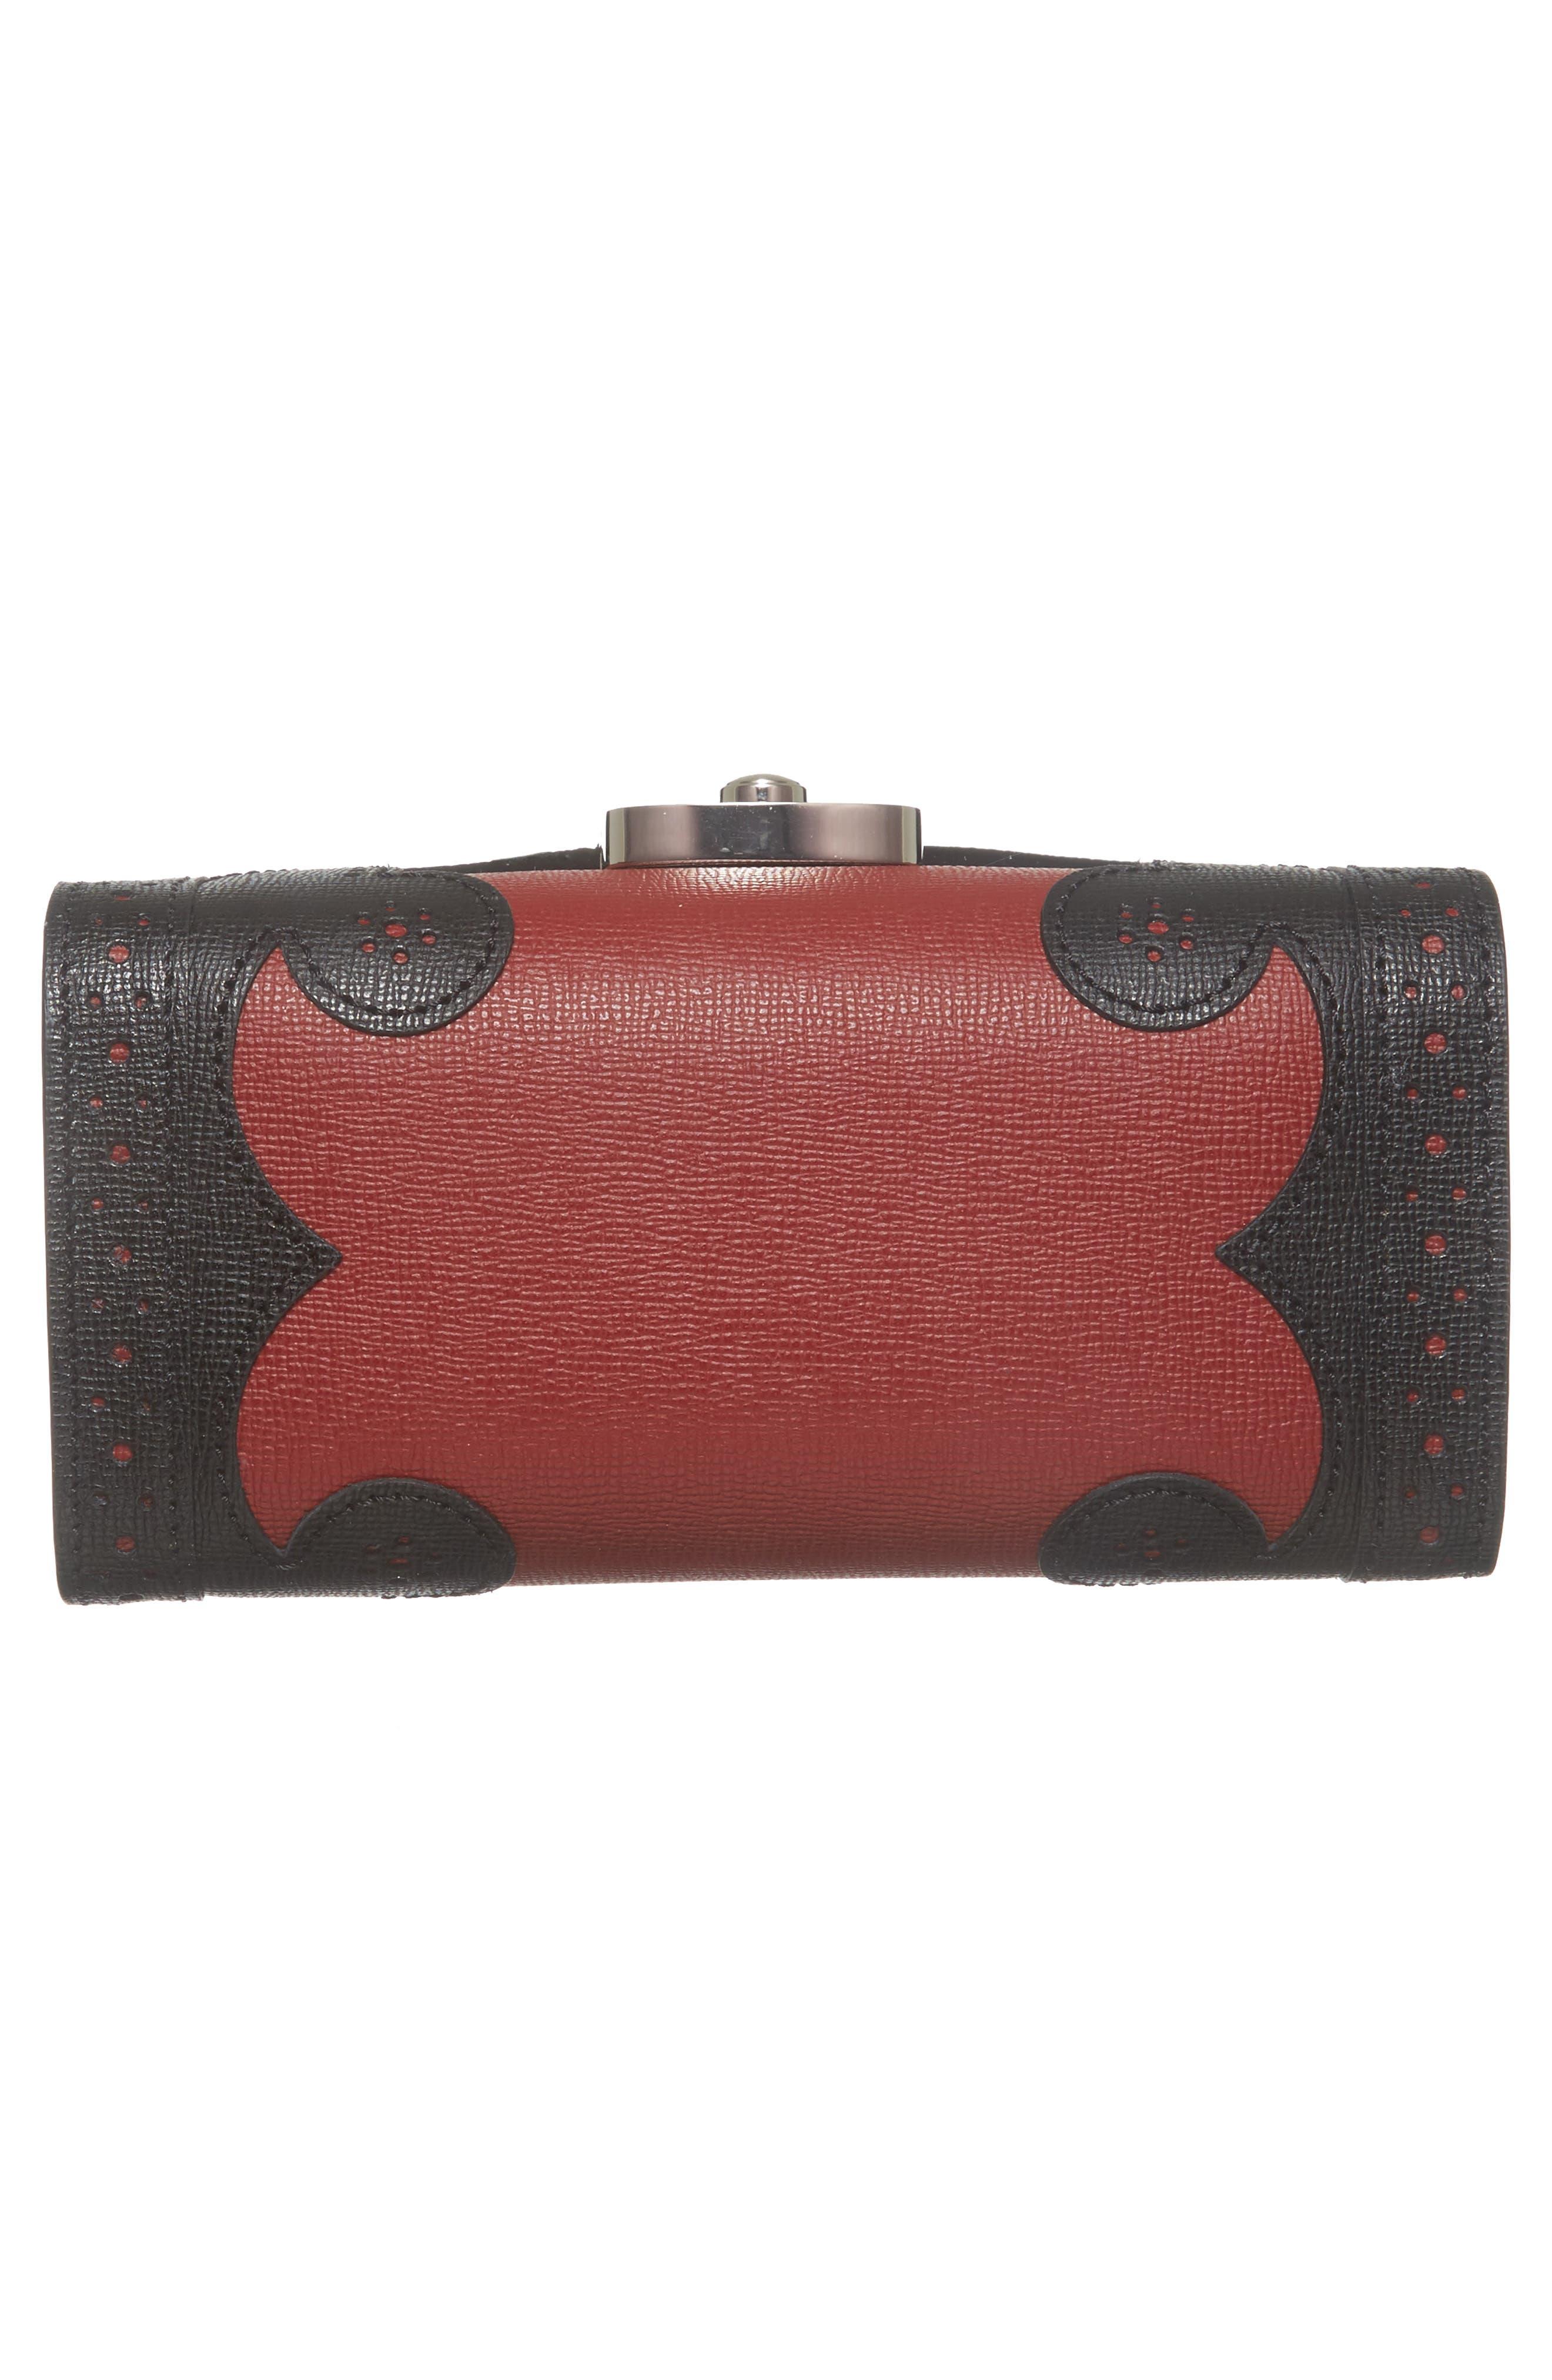 Effrontée Leather Crossbody Bag,                             Alternate thumbnail 5, color,                             Red Lacquer